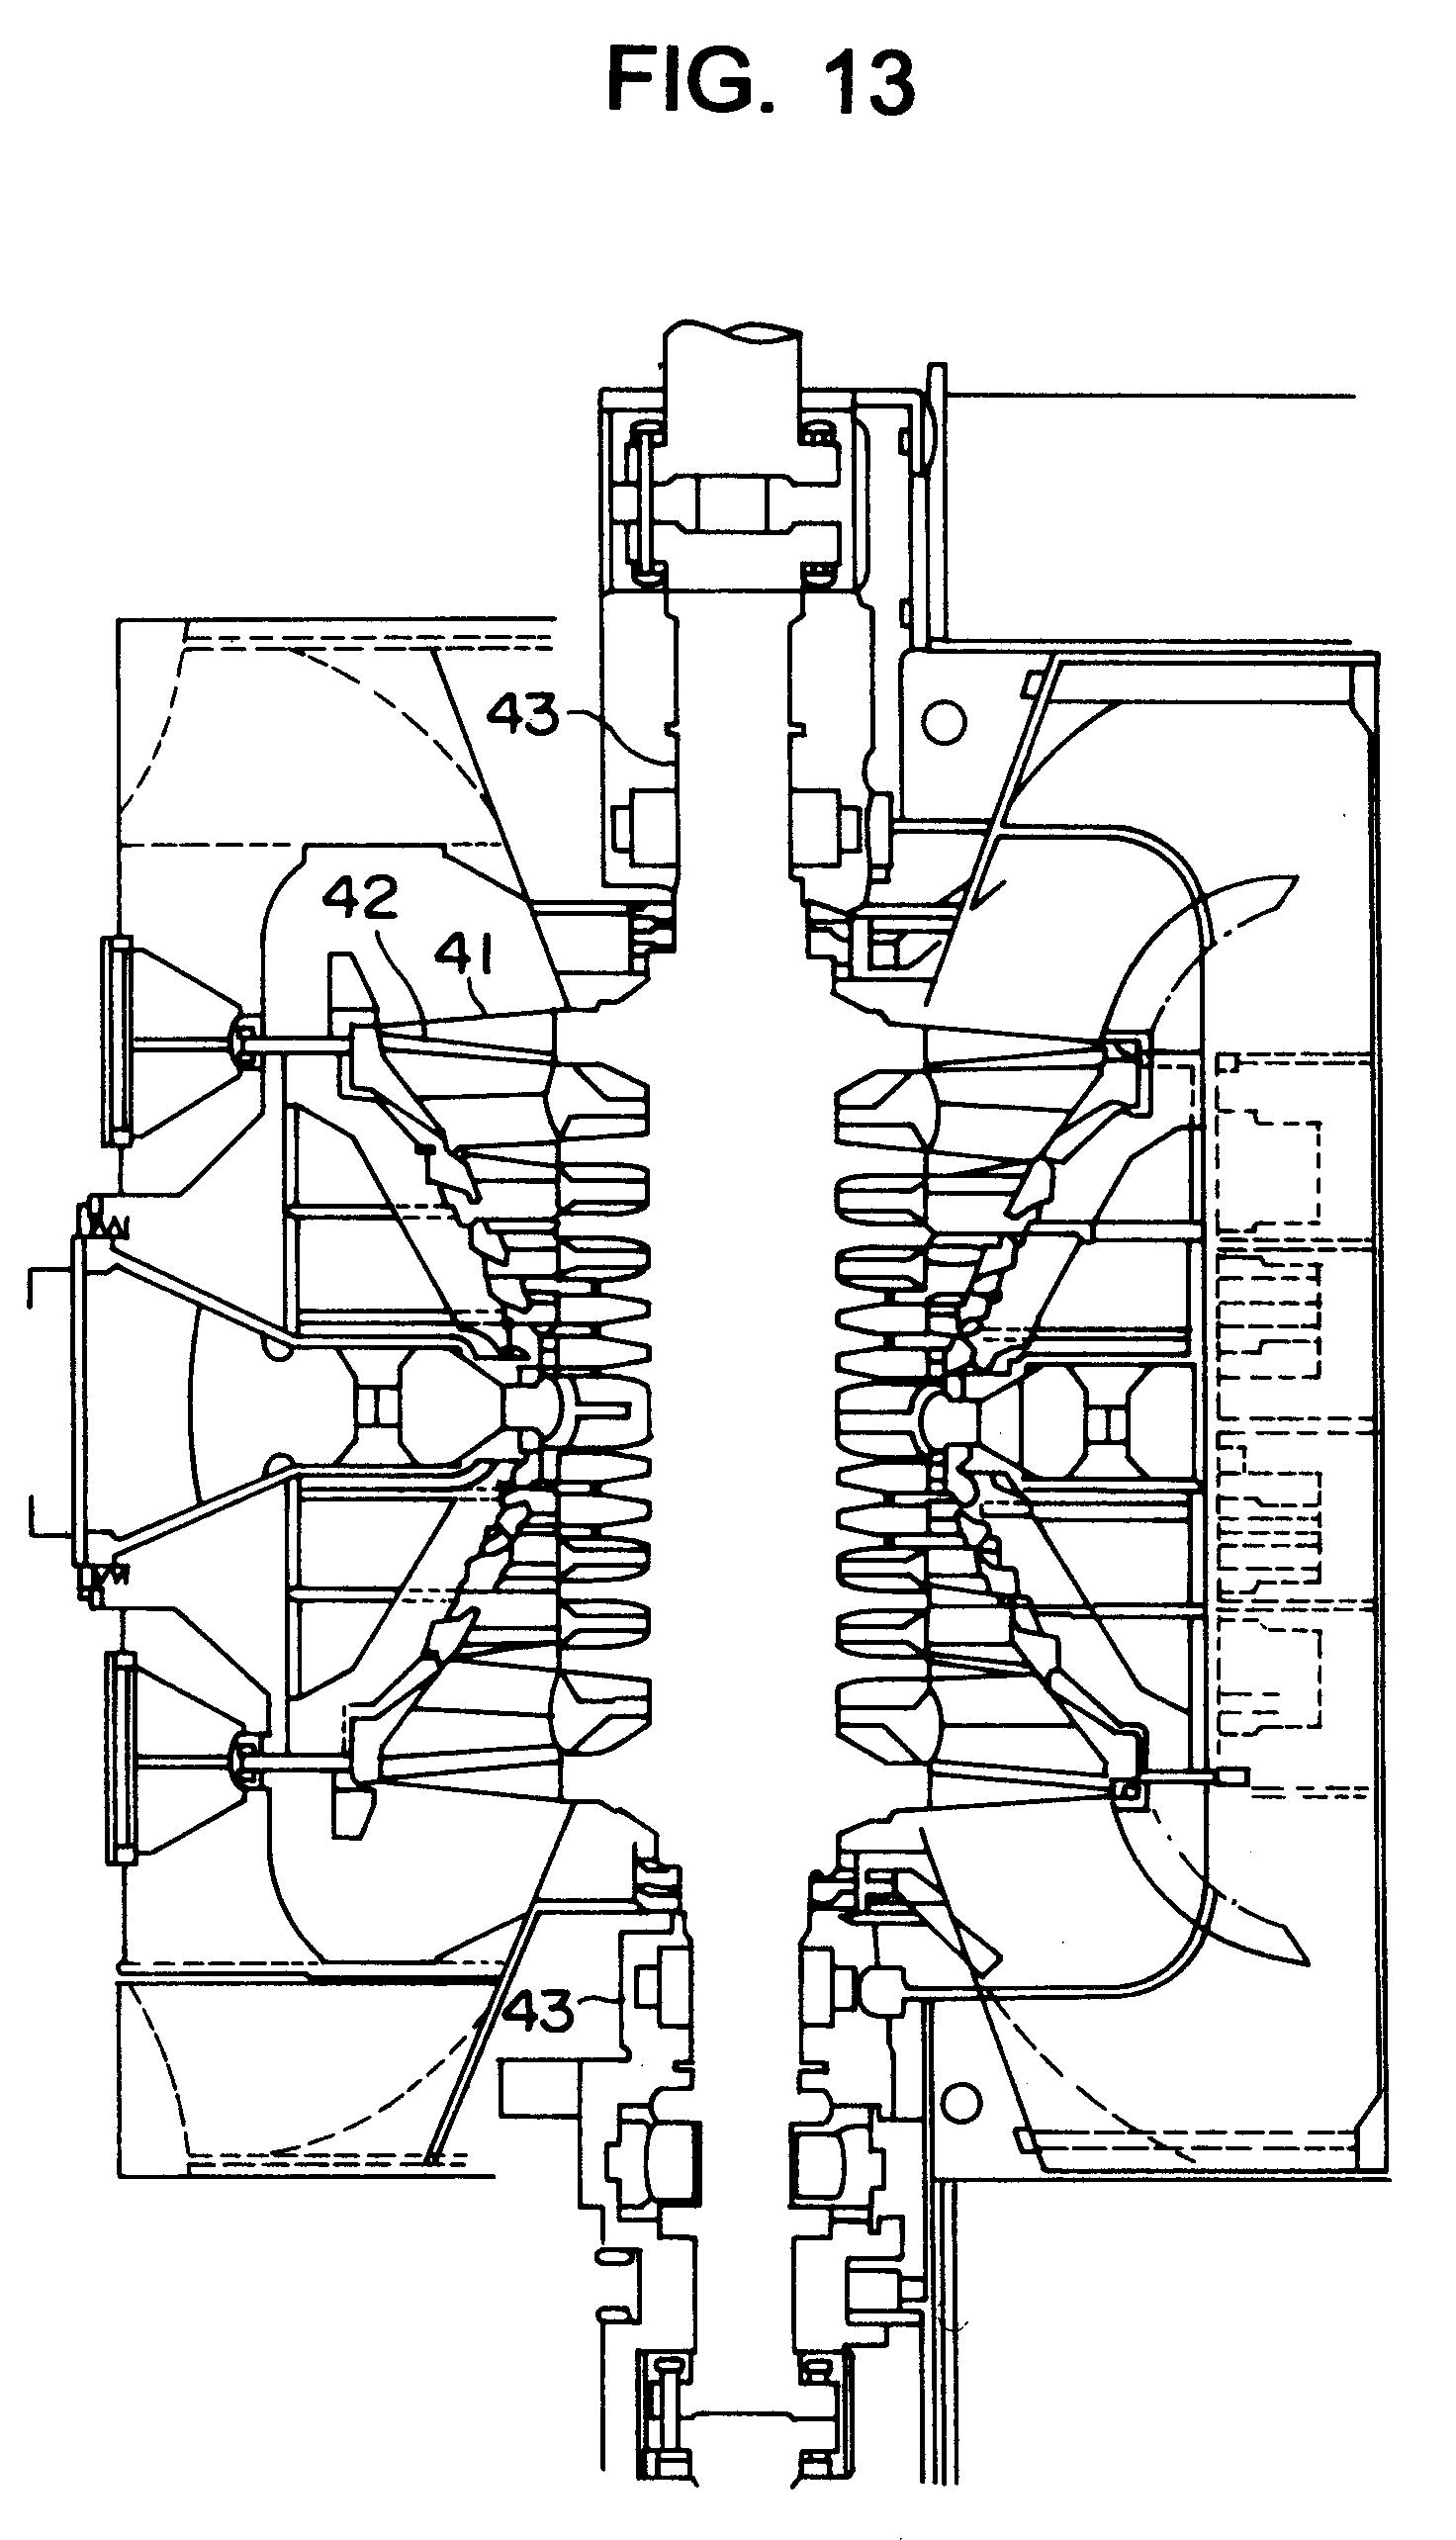 Colorful Horn Wiring Diagram Honda Trx420 Photos - Wiring Diagram ...